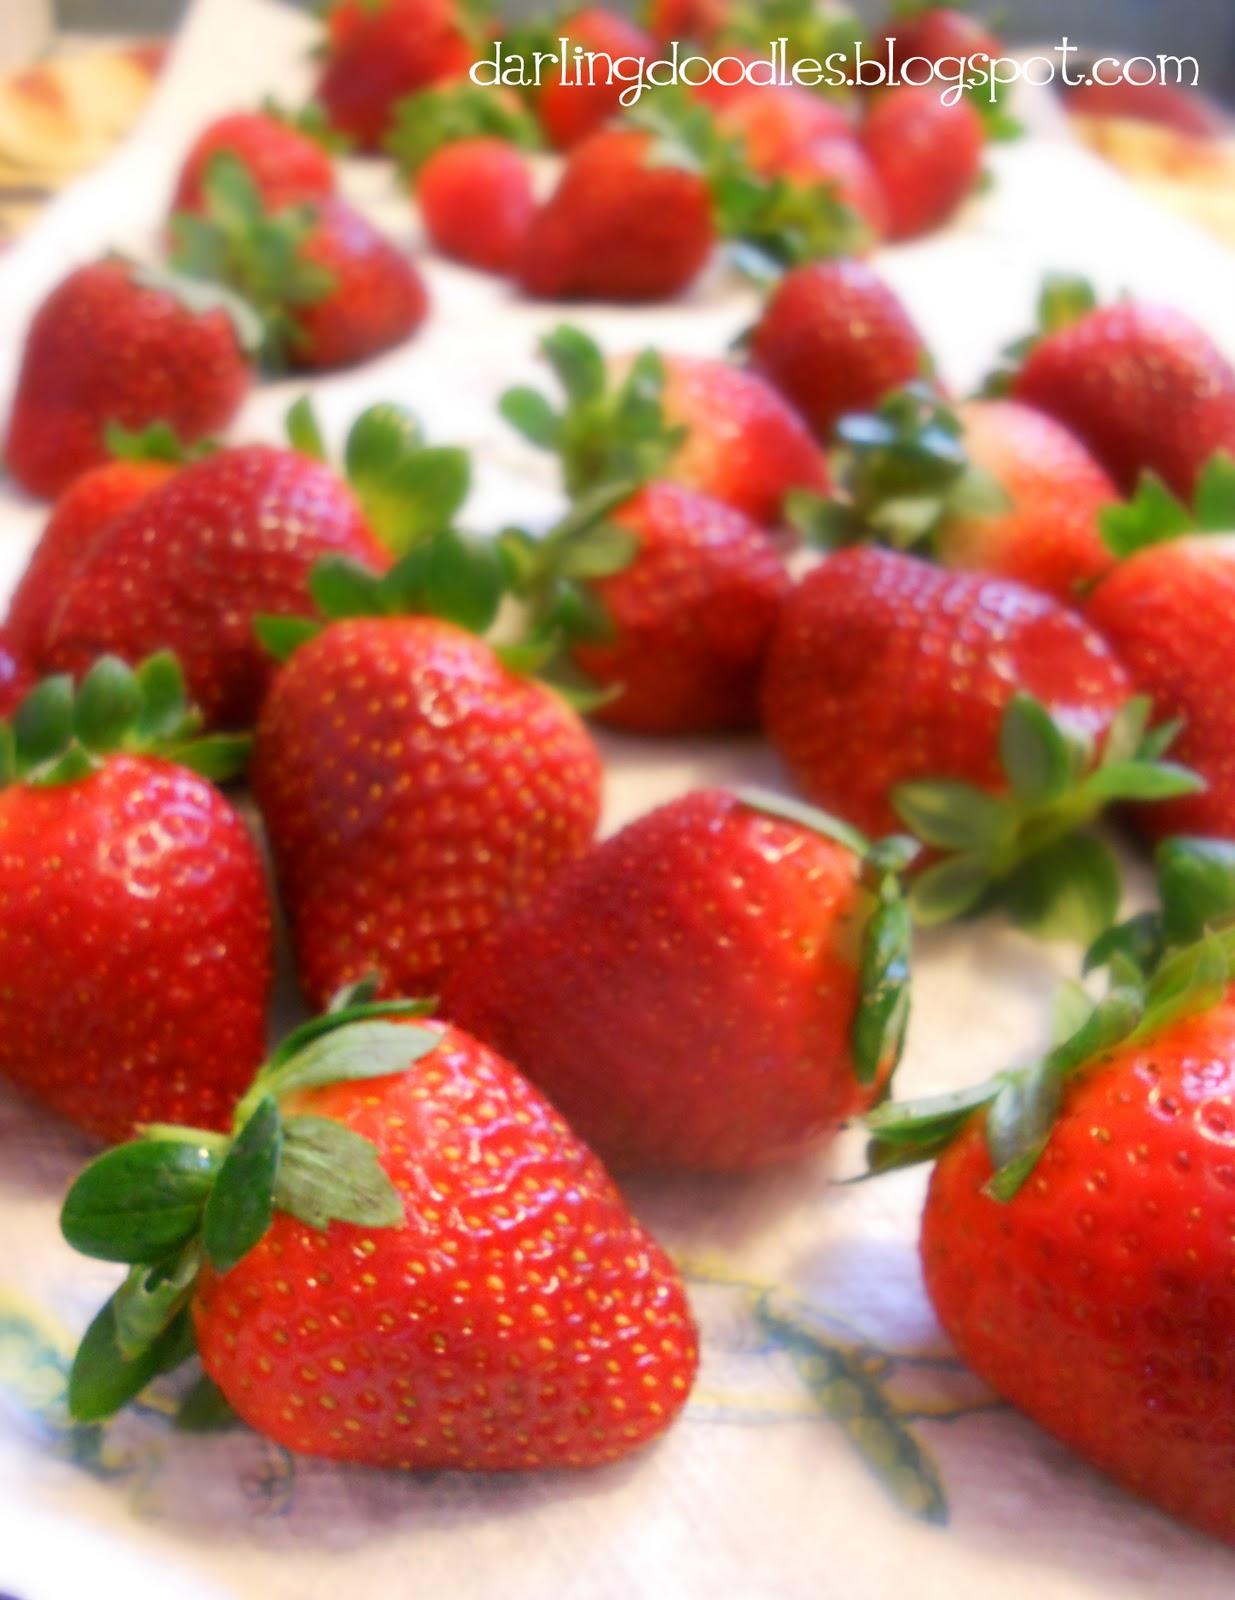 Chocolate Dipped Strawberries - Darling Doodles